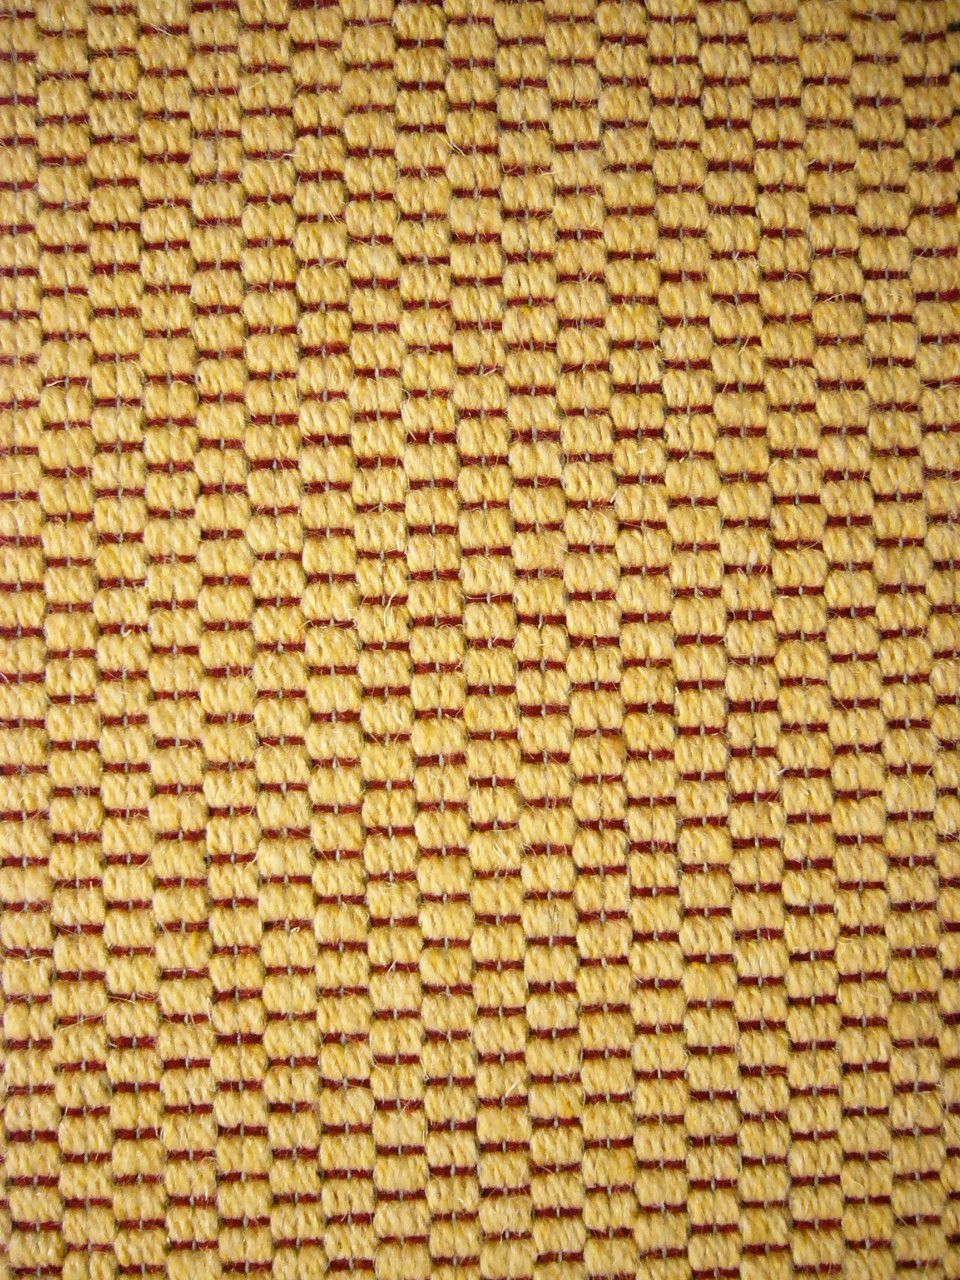 Antigua by Presitge - Wool - Carpet - Pattern - Commercial - Residential : Carpets in Dalton